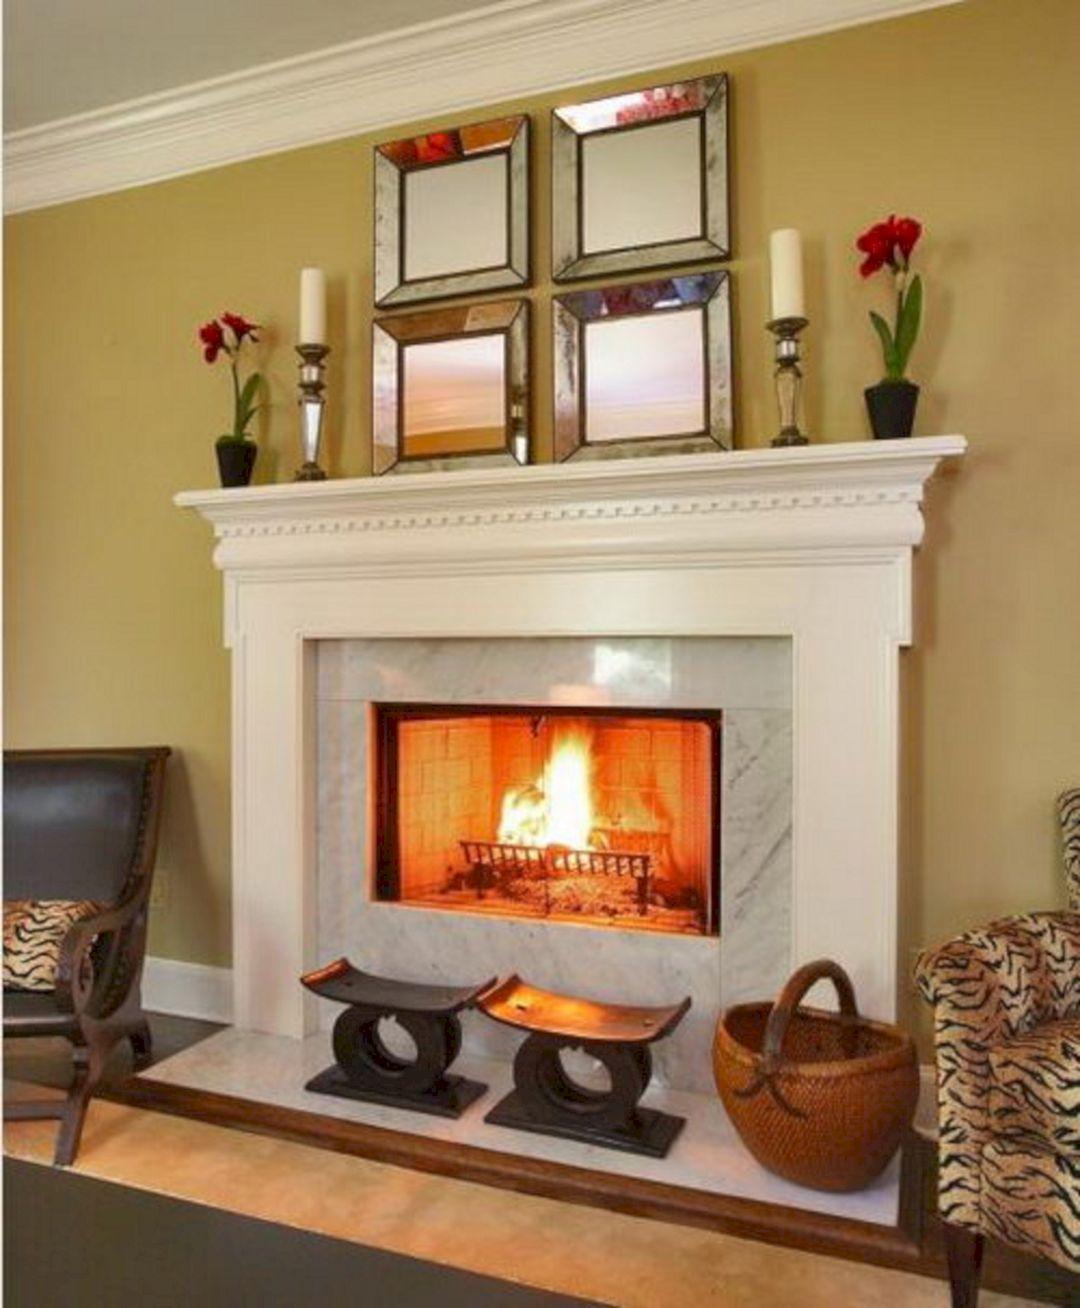 Best 30+ Super Beautiful Marbel Fireplace Mantel Design Ideas for Inspiration – DECOREDO